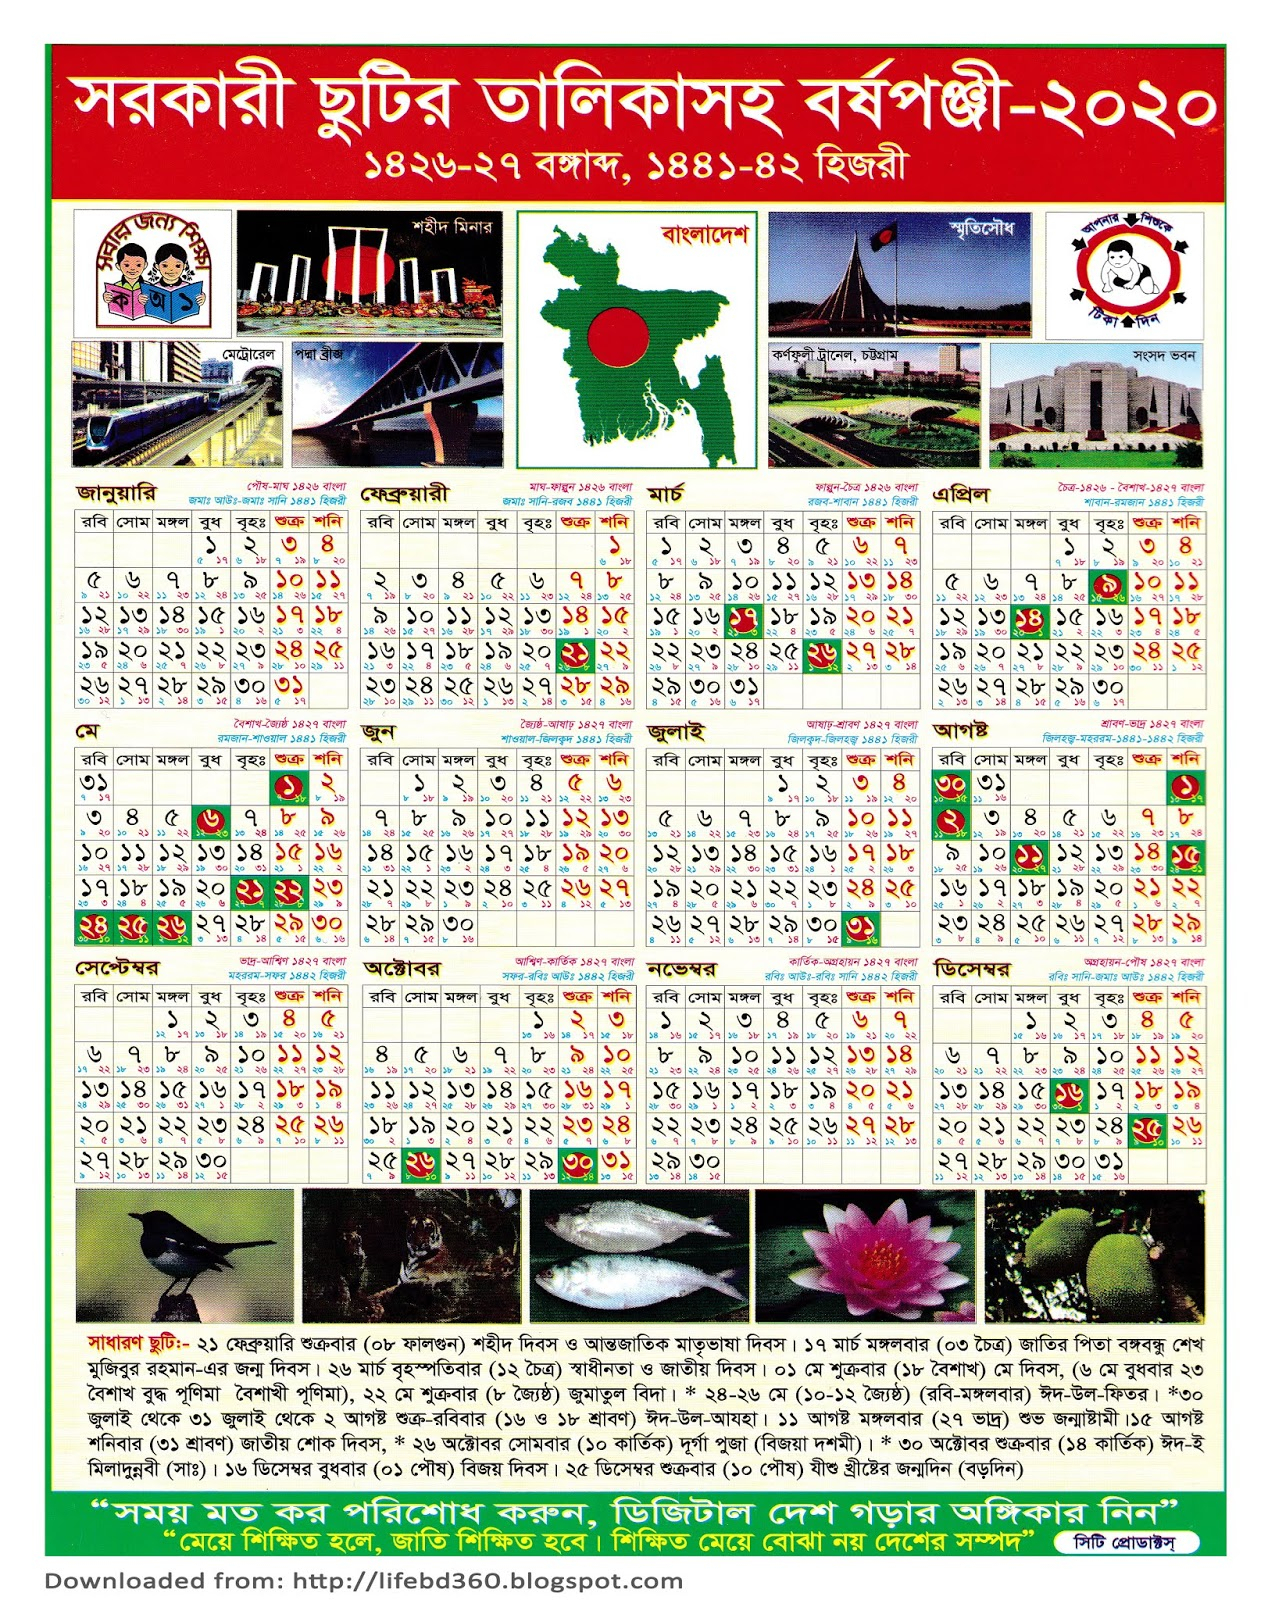 Bangladesh Government Holiday Calendar 2020 | Life In Bangladesh